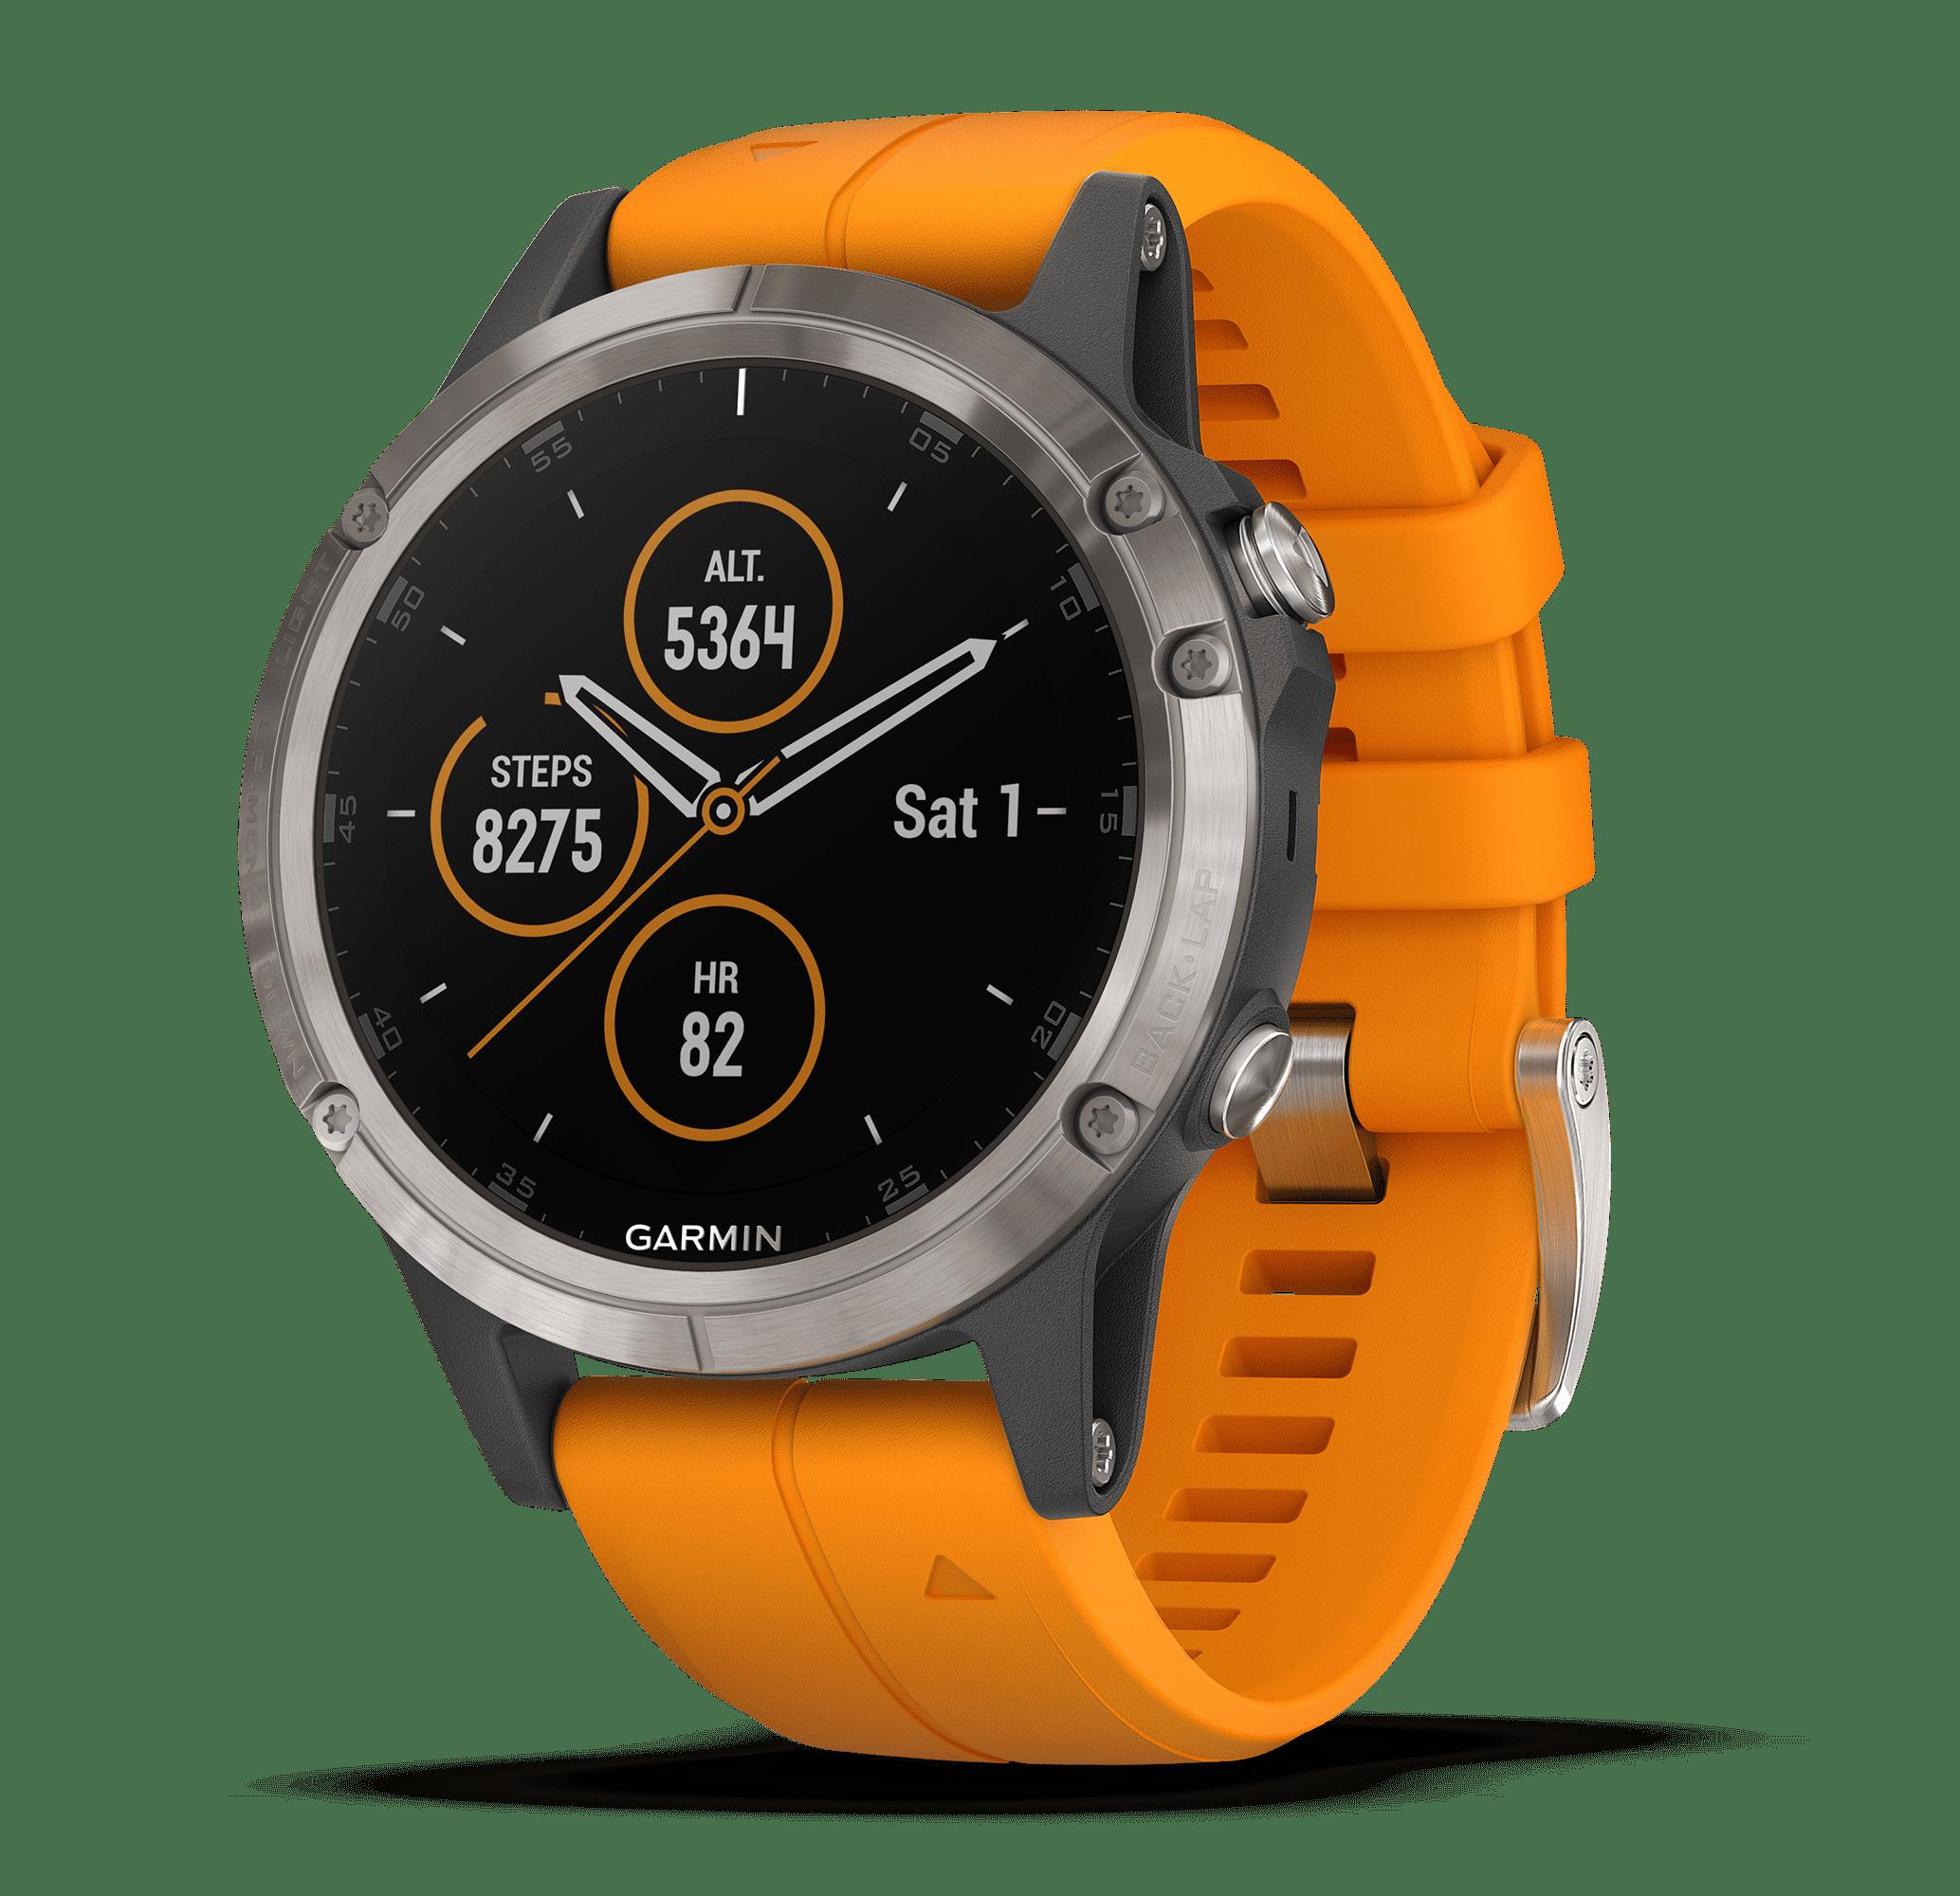 Garmin Fenix 5 Plus Sapphire Premium Multisport Watch with Music, Maps, and Garmin Pay